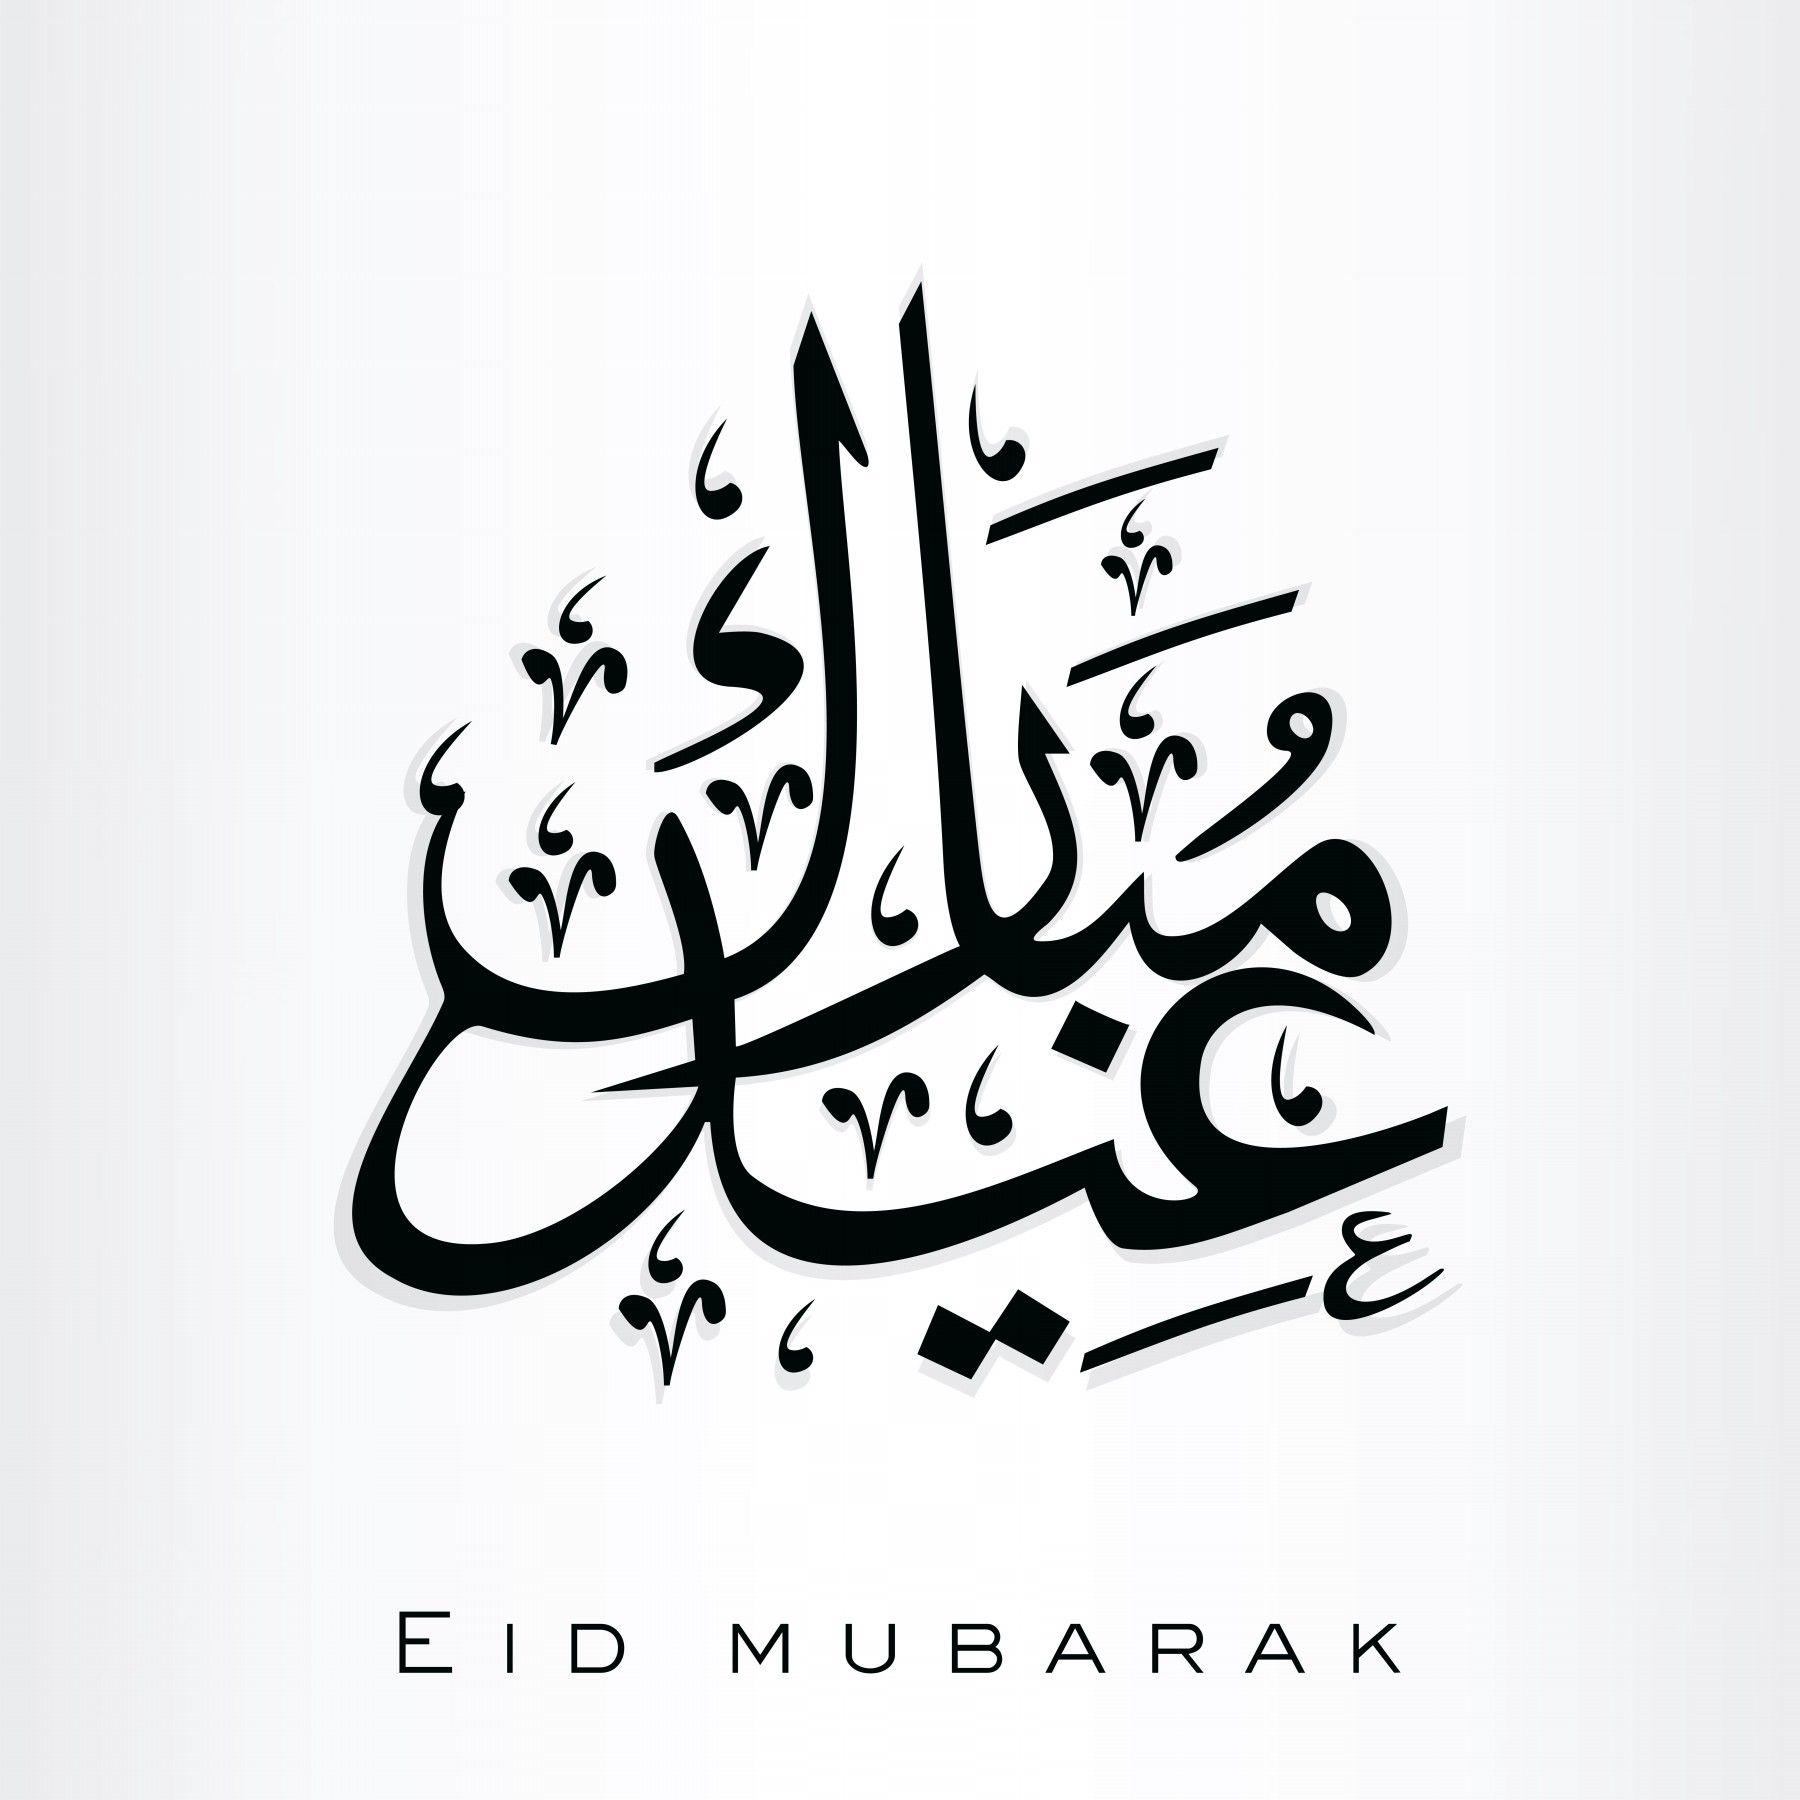 Eid Mubarak Thuluth Calligraphy Eid Mubarak Words Idul Fitri Png And Vector With Transparent Background For Free Download Eid Mubarak In Arabic Eid Mubarak Eid Stickers